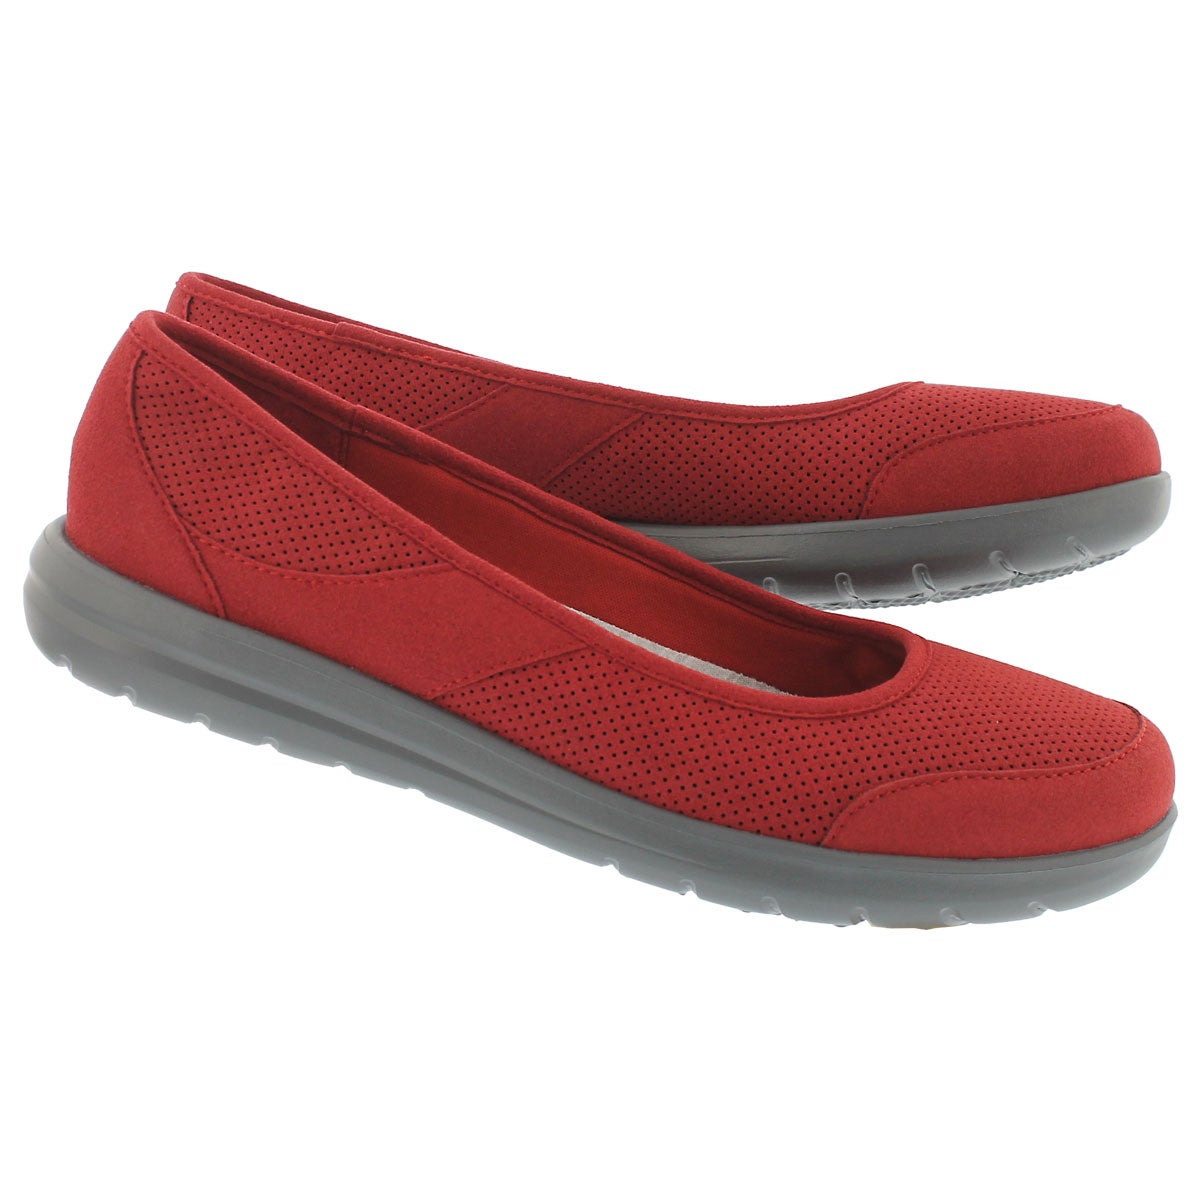 Lds Jocolin Myla red perf casual flat